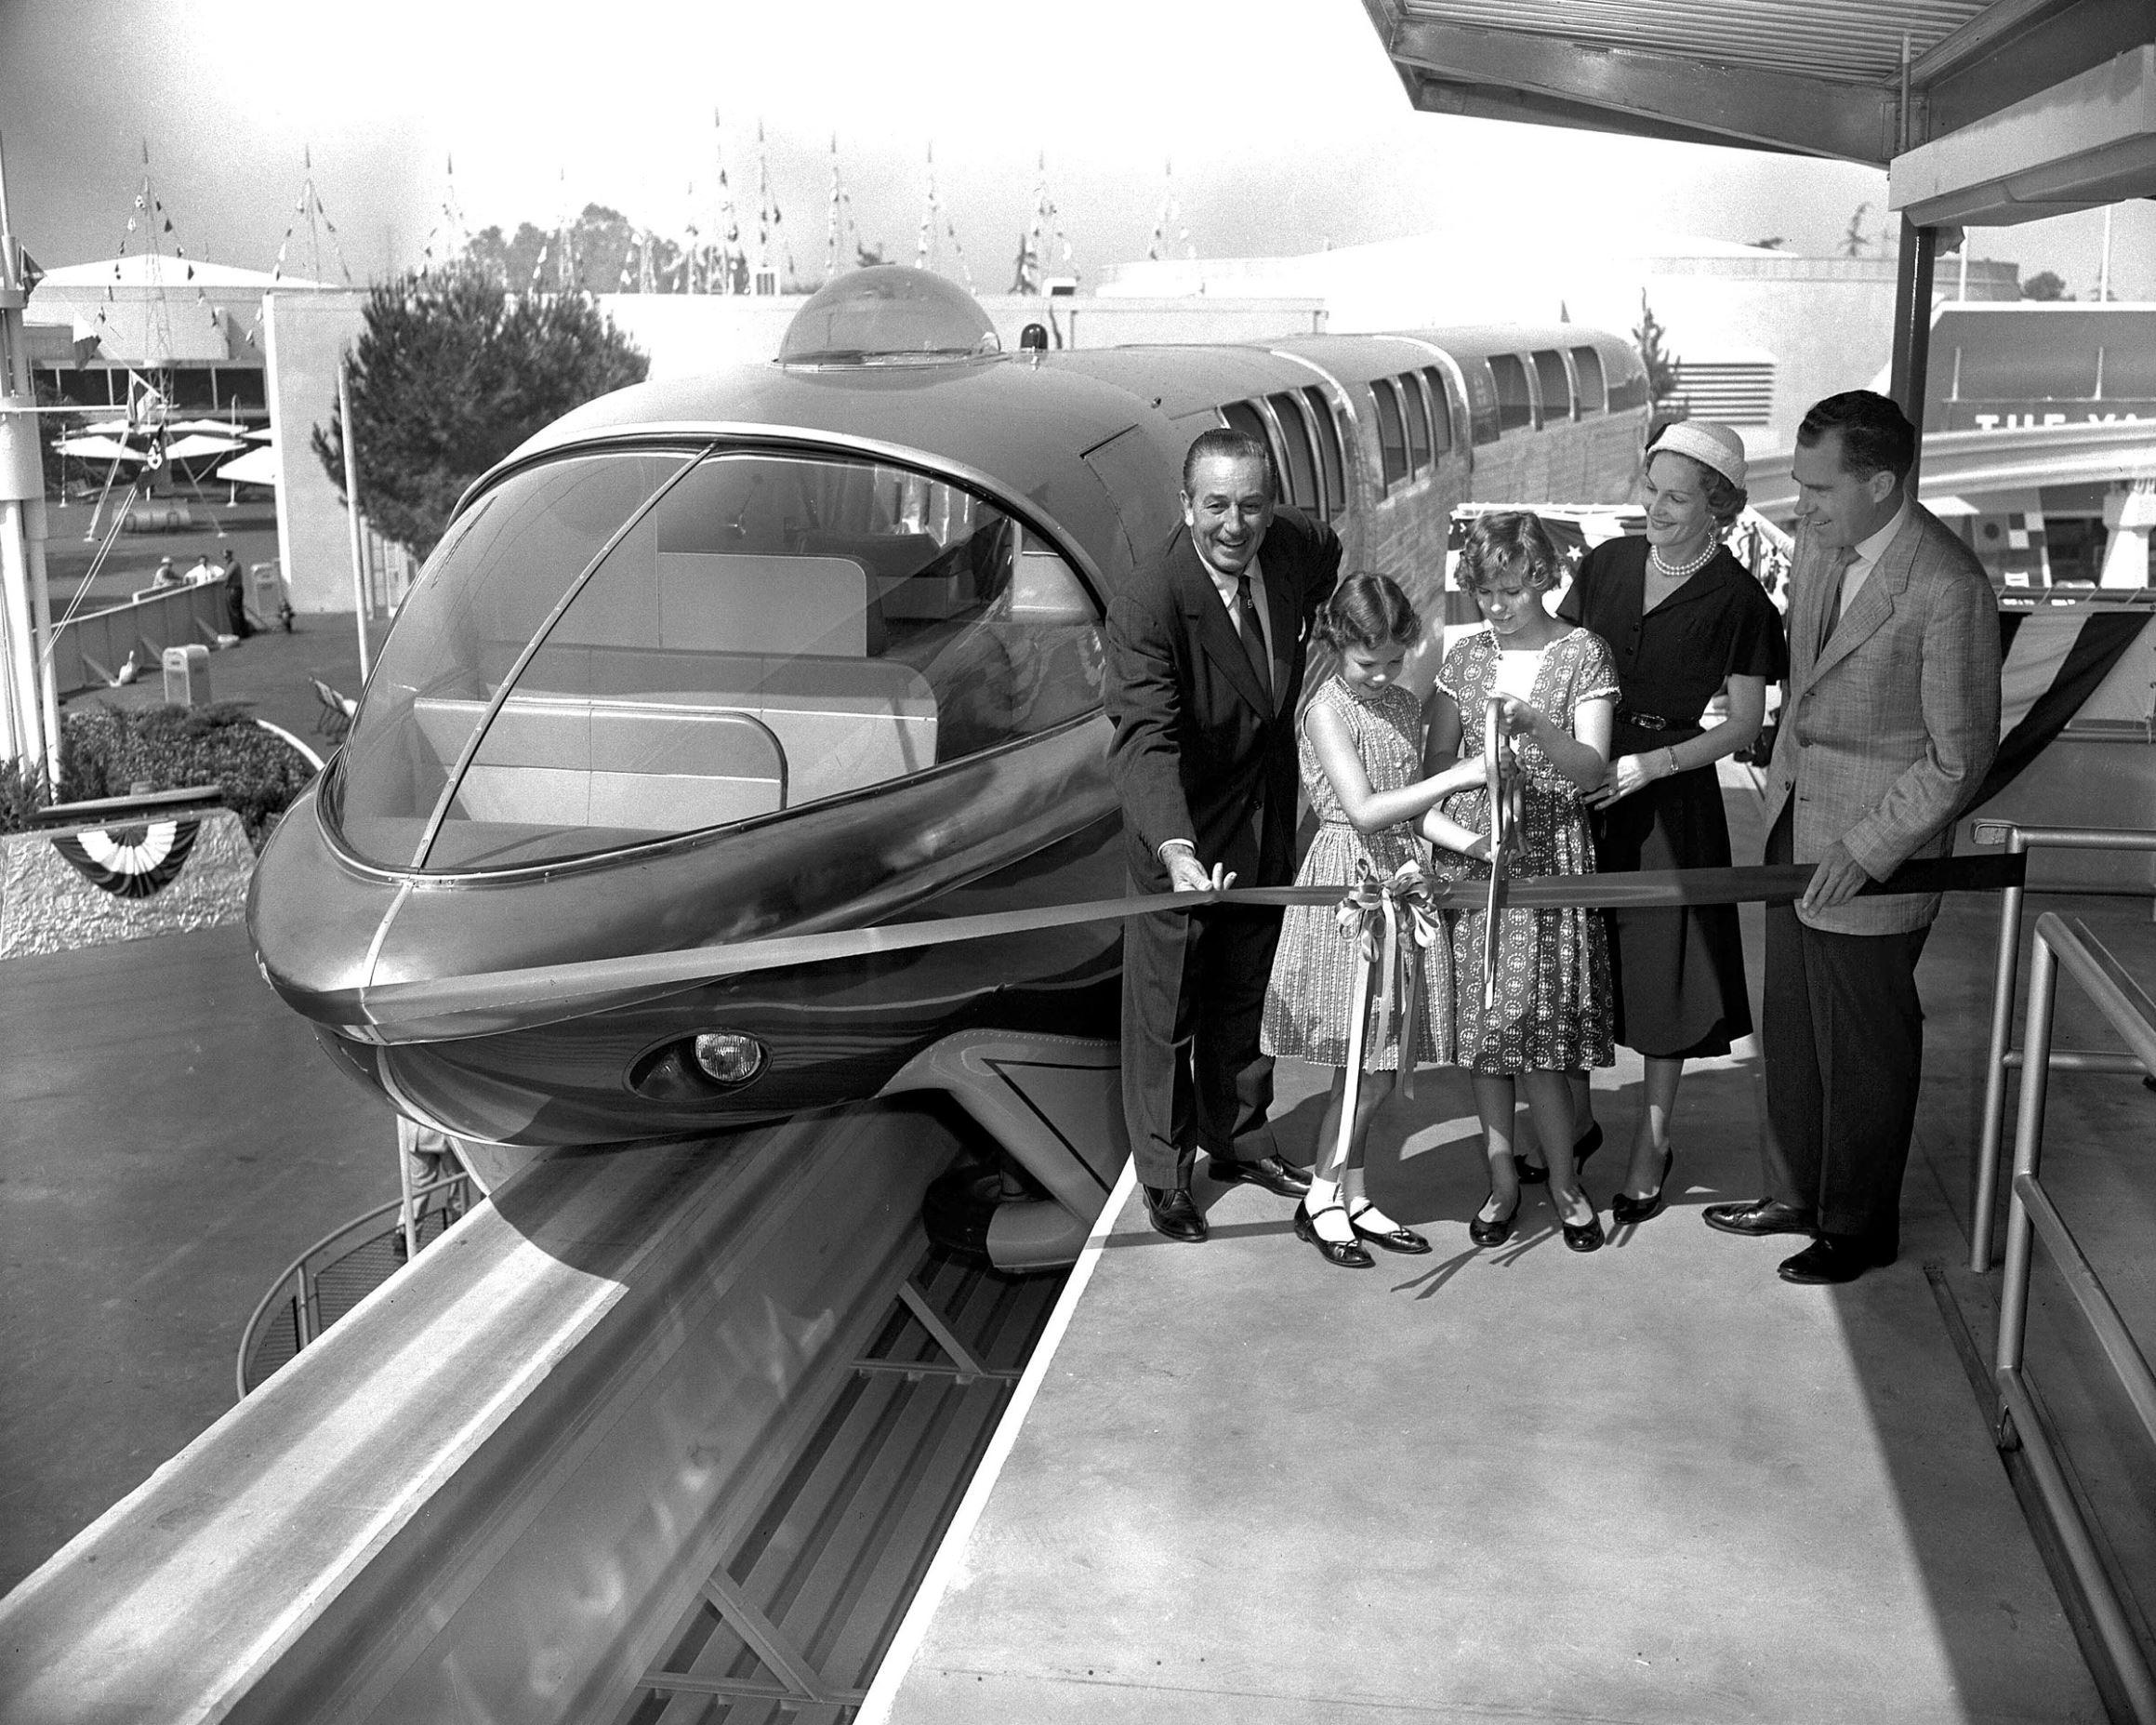 Slide 13 of 33: VARIOUS - 1950S Walt Disney assists Richard Nixon and family in dedicating the Monorail at Disneyland, Florida, America - 1959